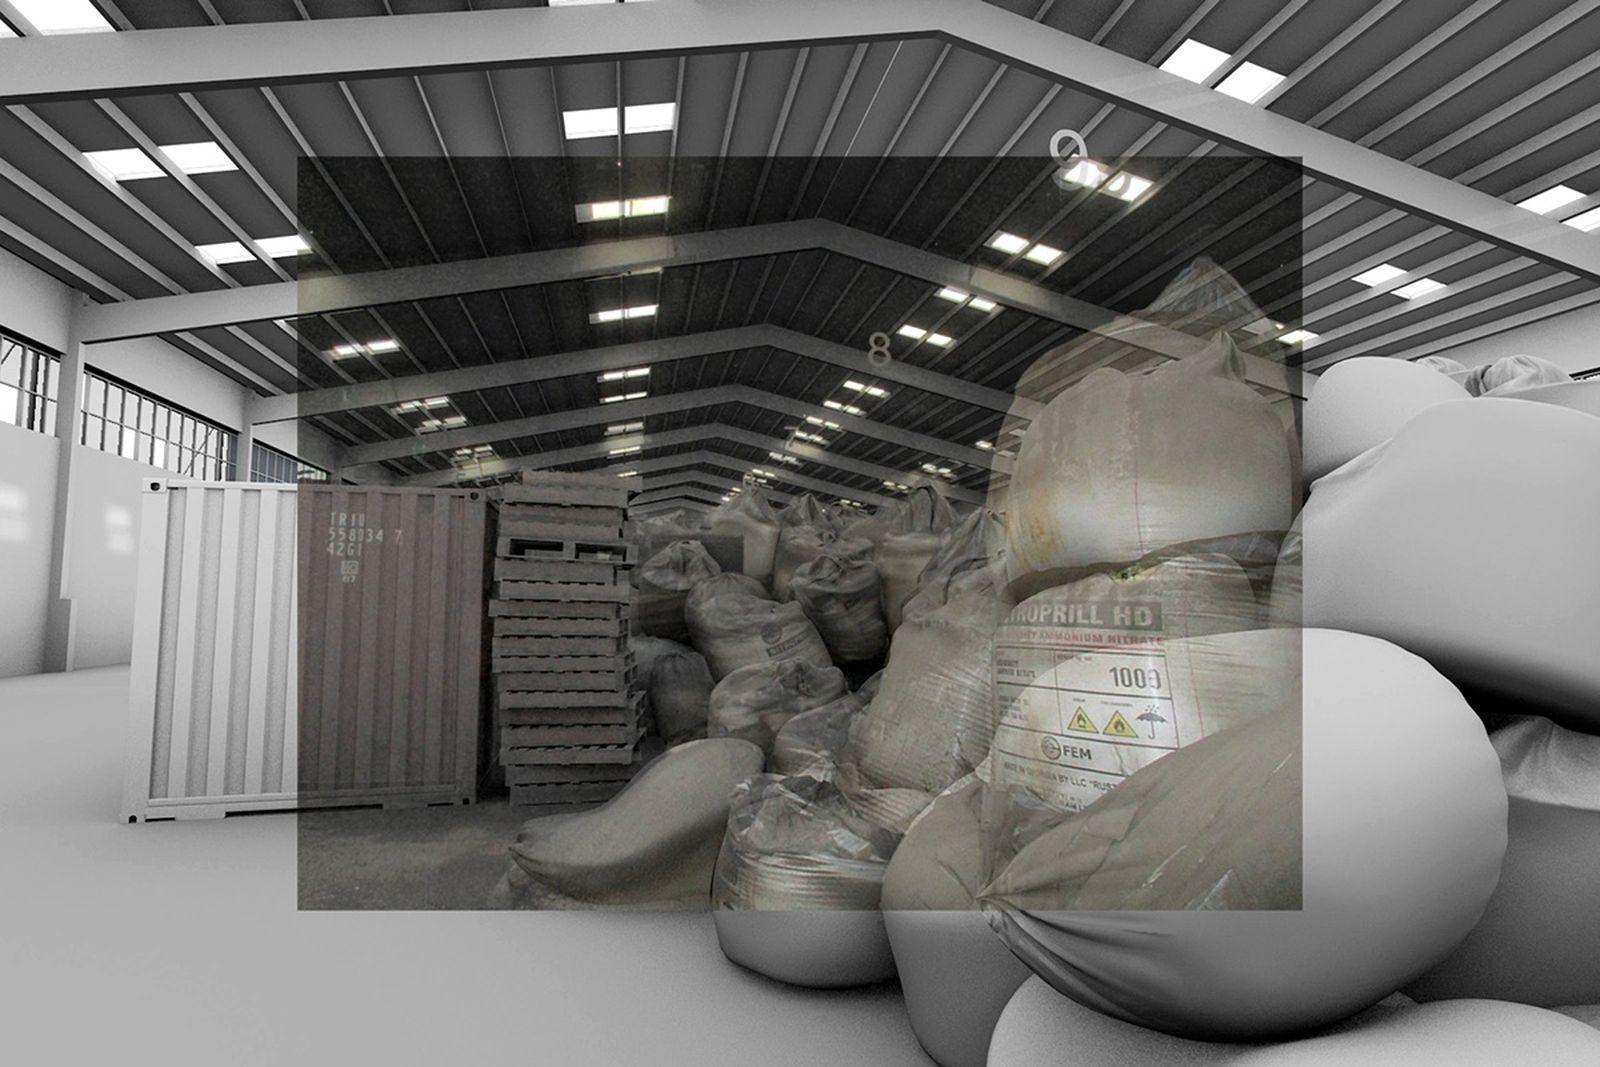 forensic-architectures-beirut-port-blast-video-02